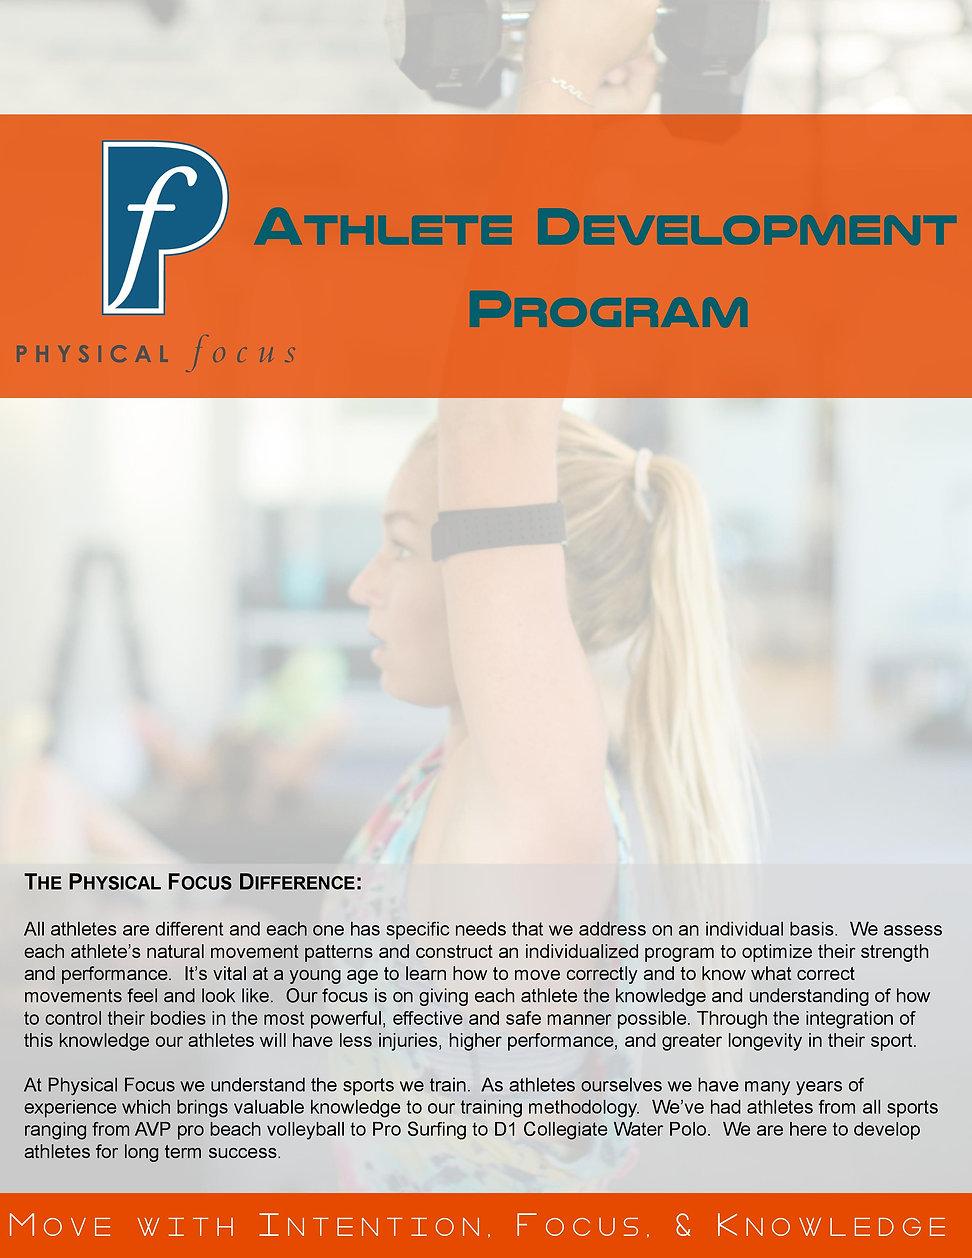 PF athlete-page-001.jpg